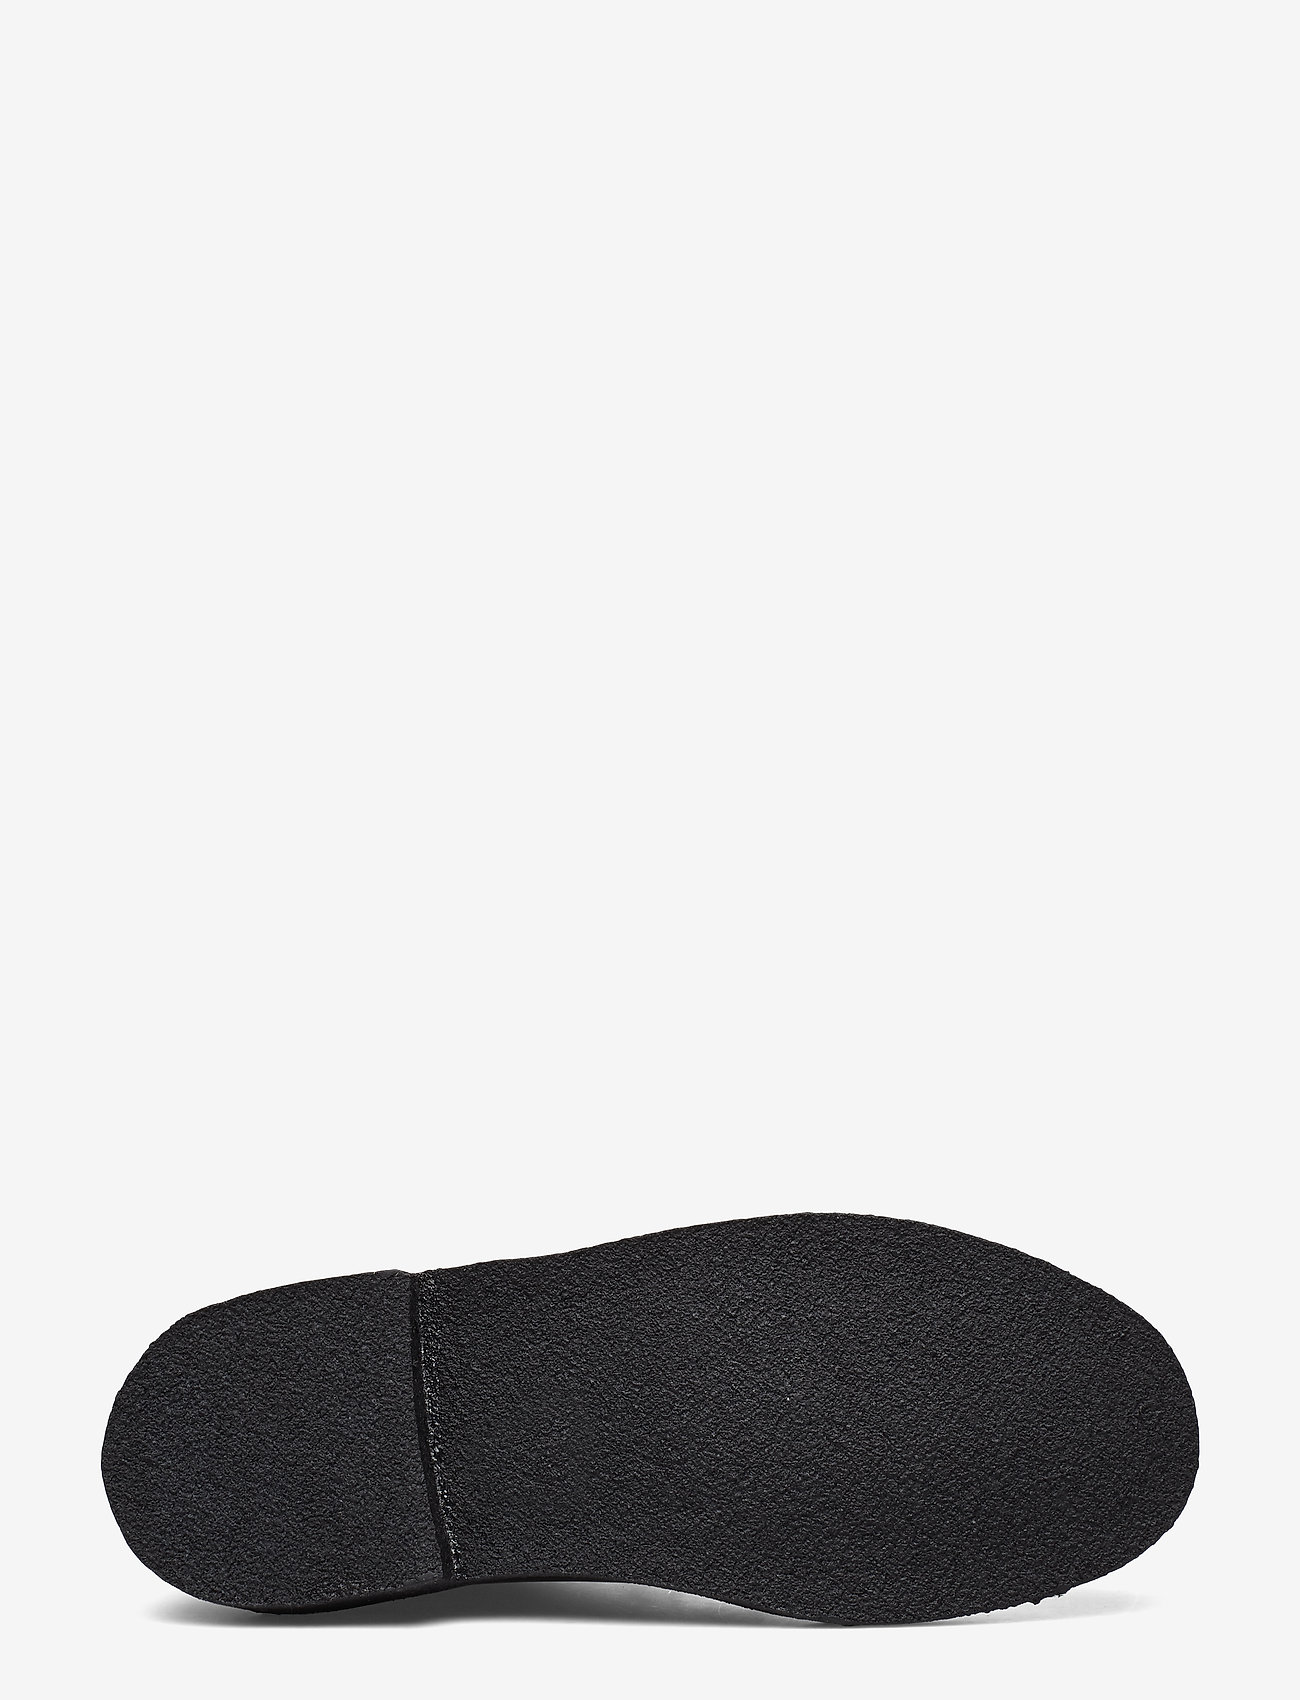 Clarks Originals - Desert London - snörskor - black leather - 4